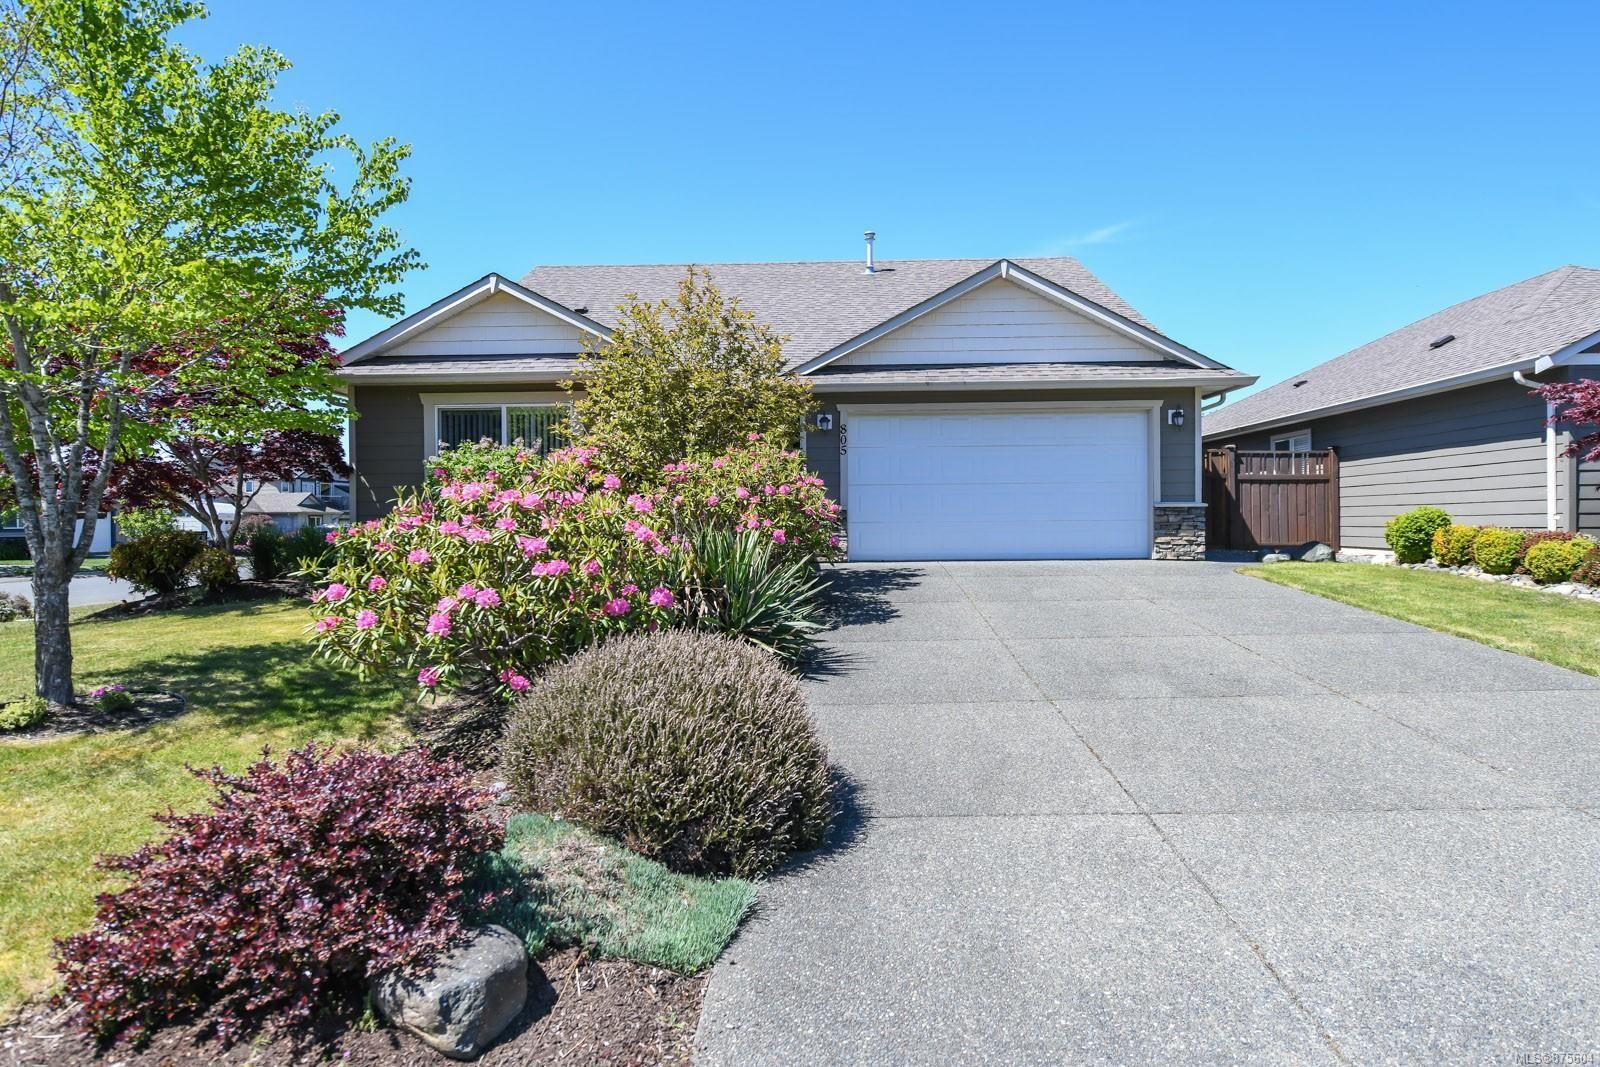 Main Photo: 805 Grumman Pl in : CV Comox (Town of) House for sale (Comox Valley)  : MLS®# 875604